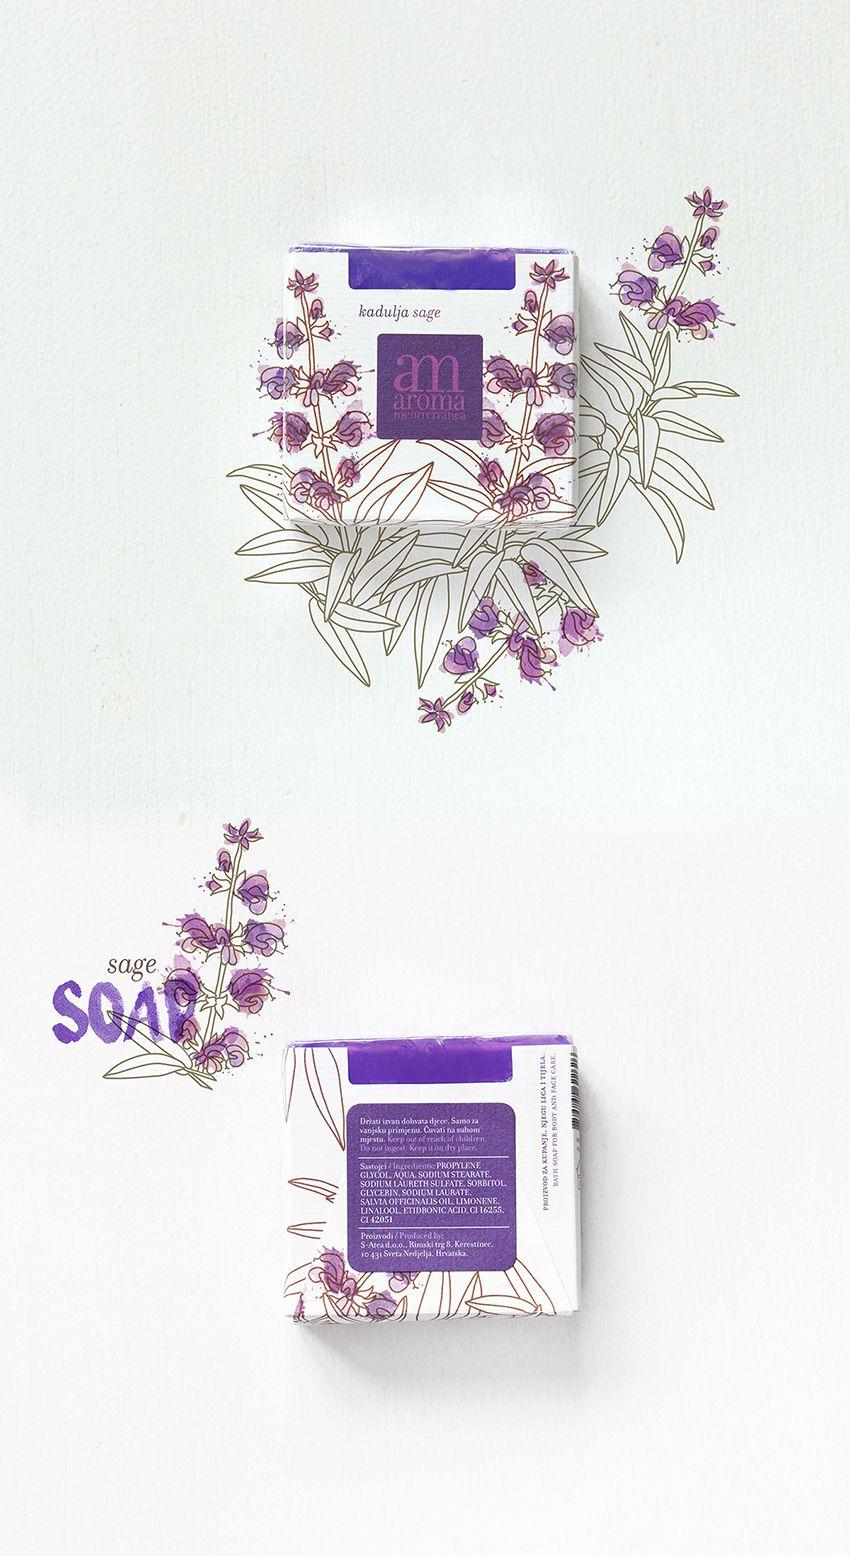 Un #packaging de #jabones naturales muy bonito || #soap #savon #naturaleza #diseño